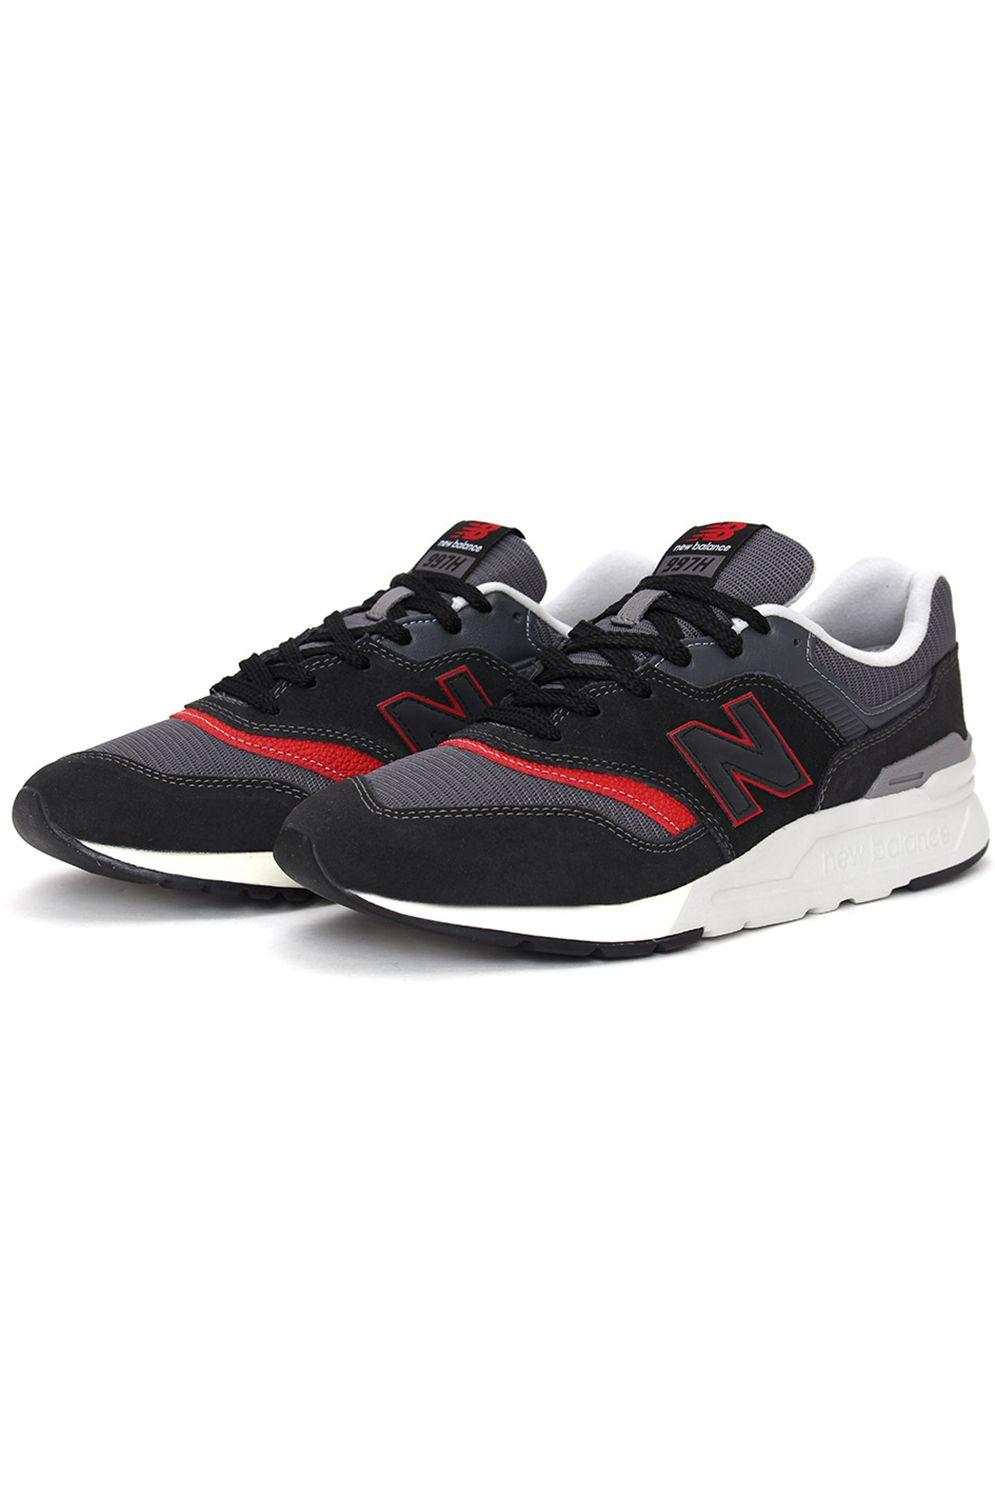 Tenis New Balance CM997 Black/Grey